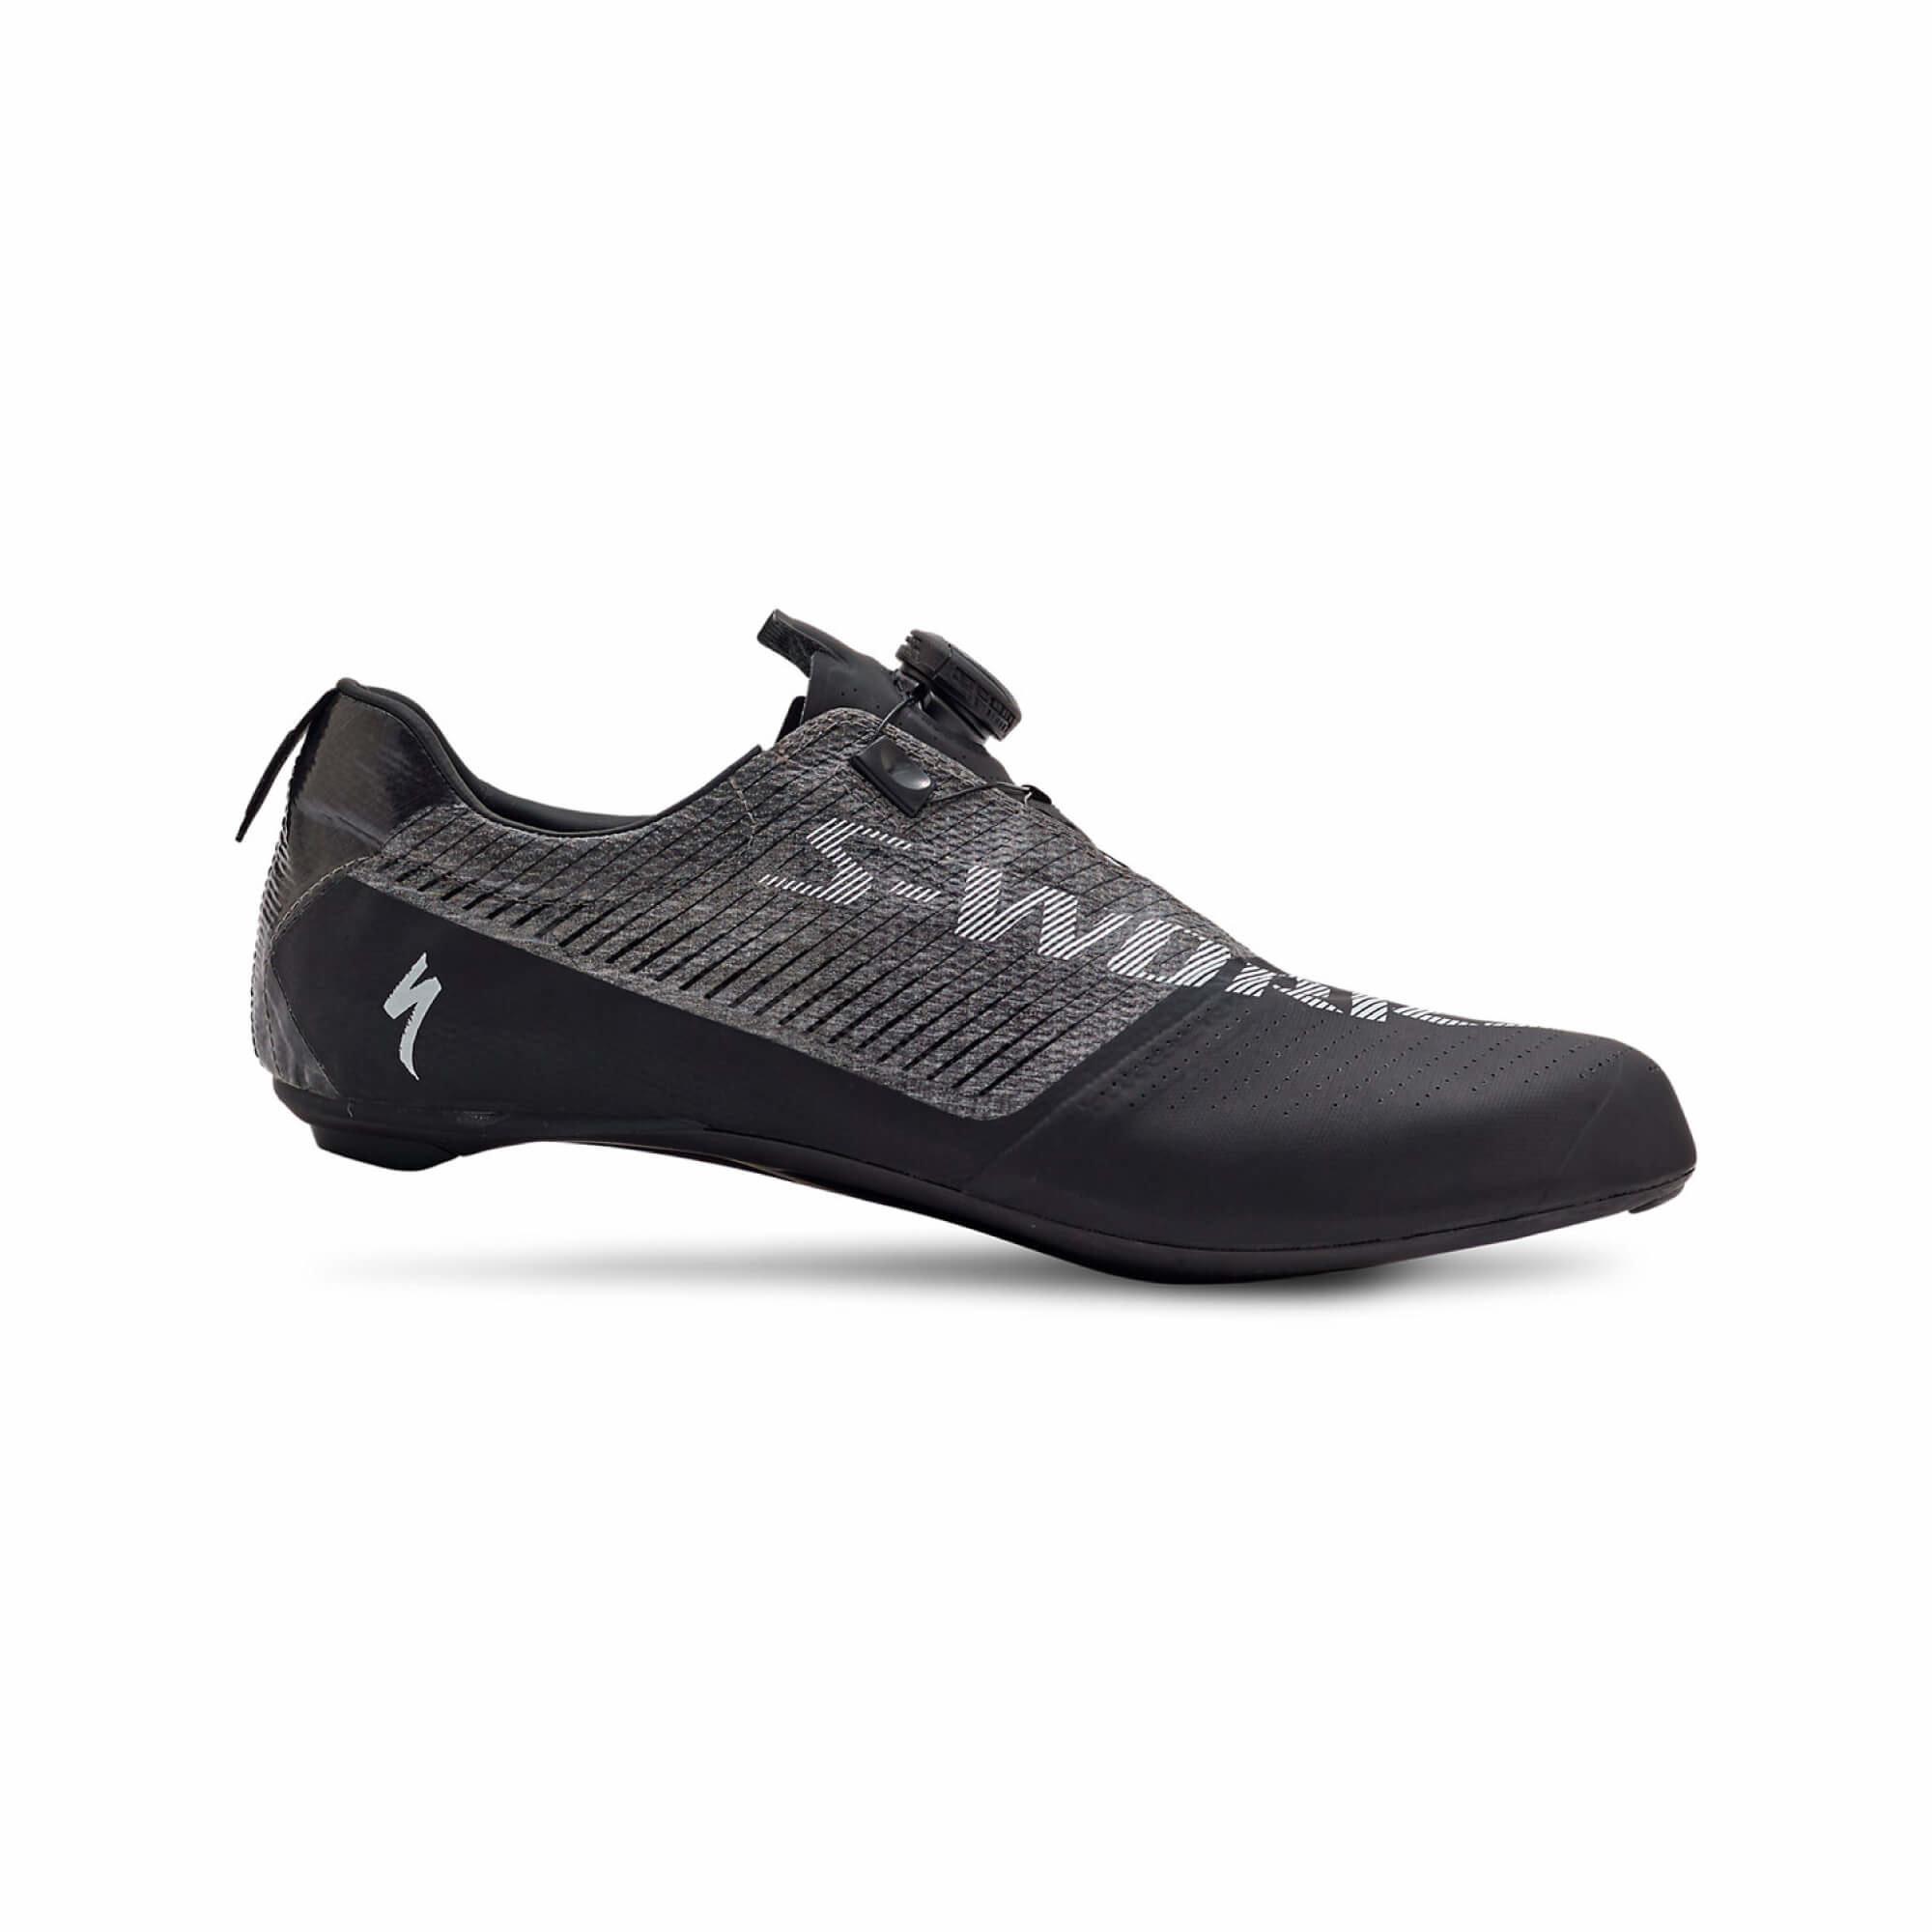 S-Works EXOS Road Shoe-11